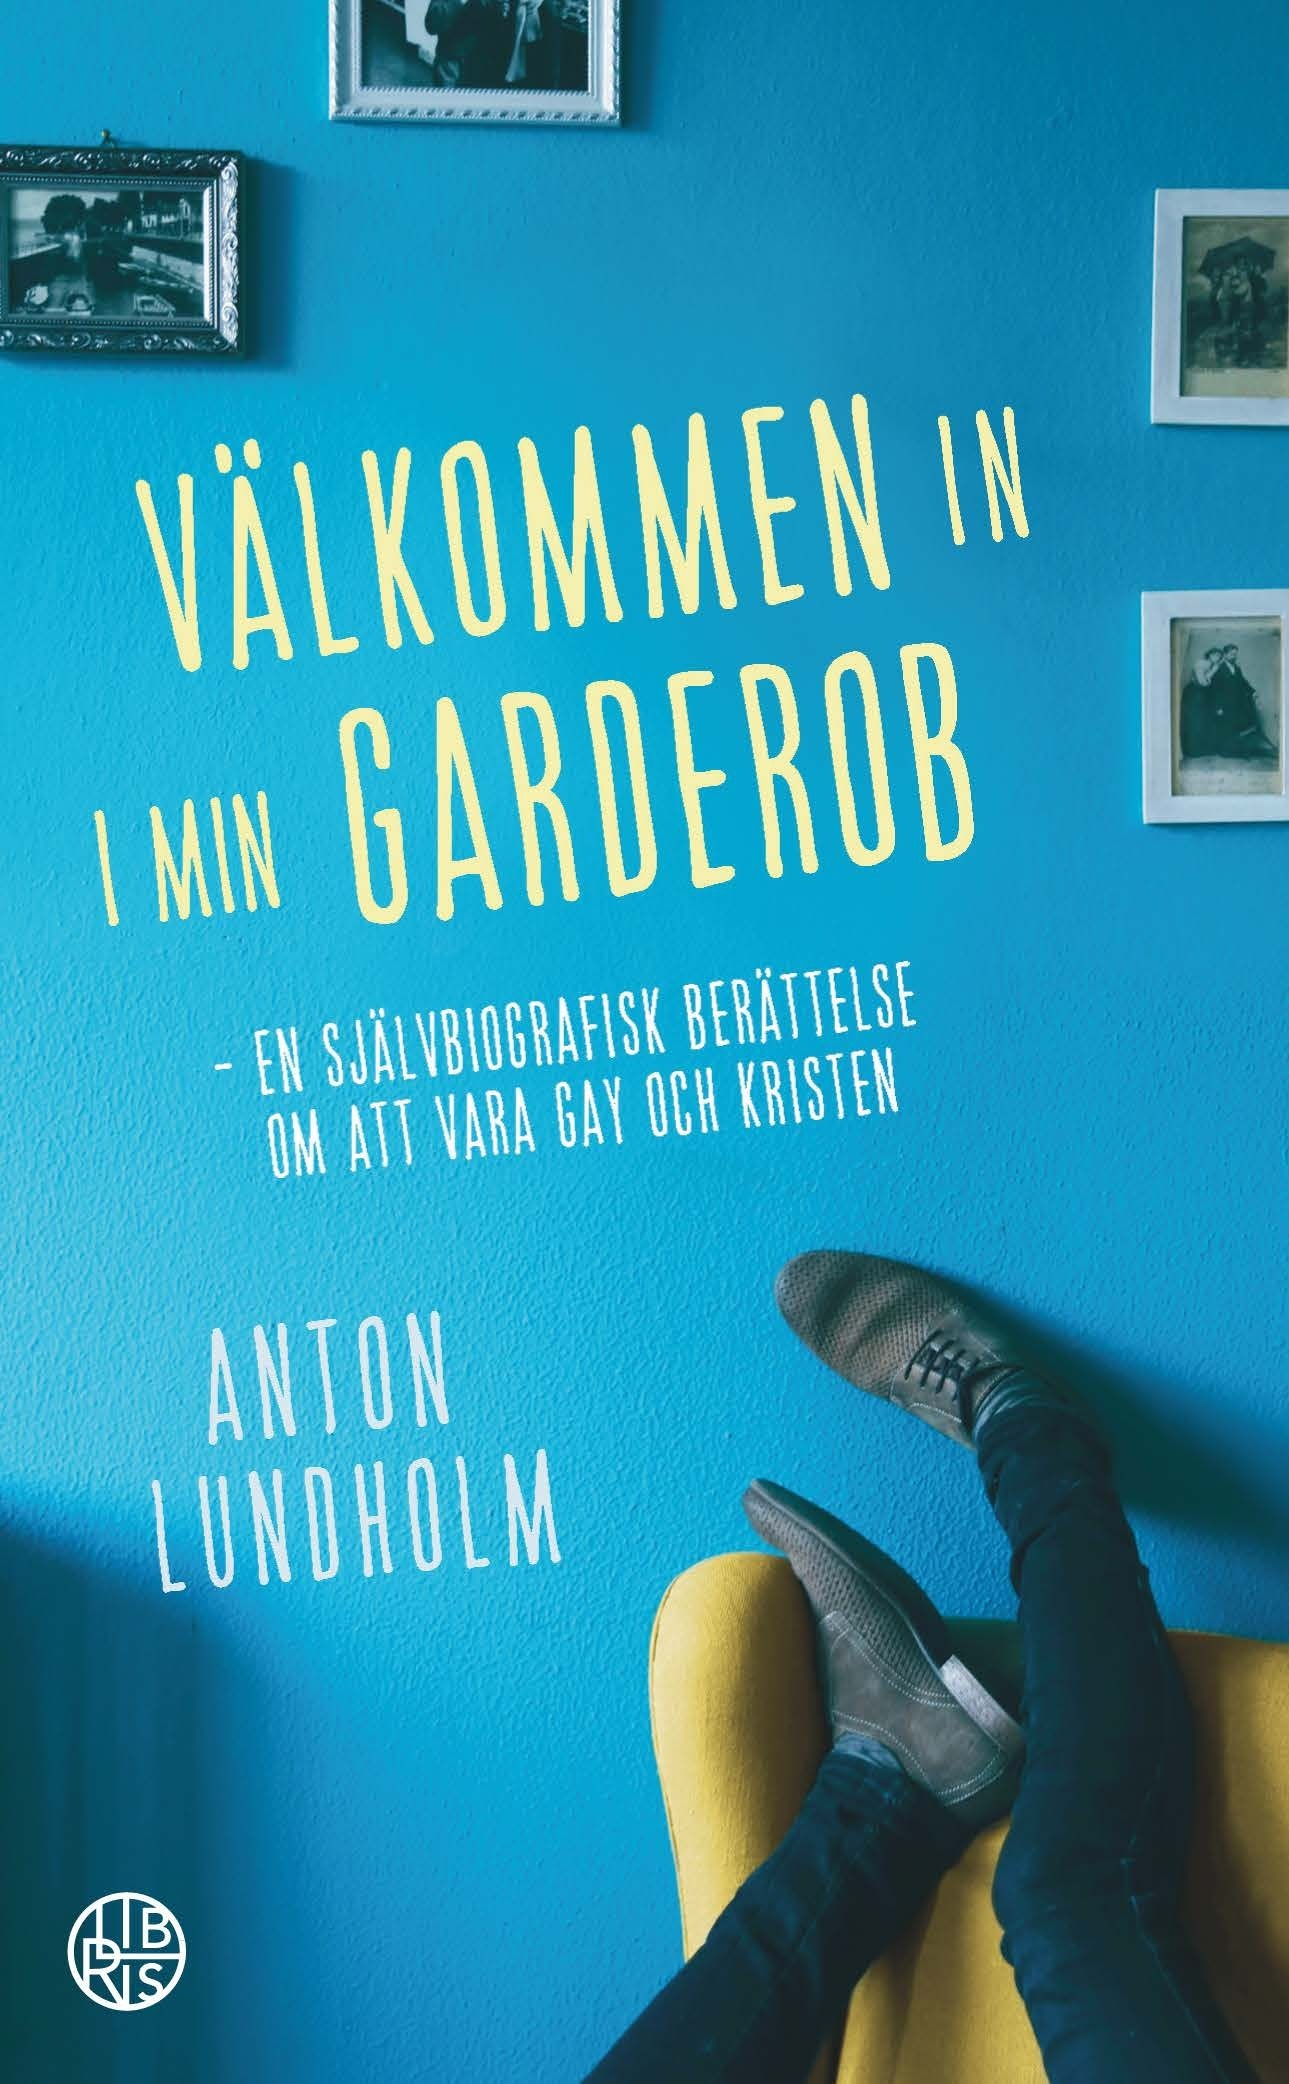 Välkommen in i min garderob, Anton Lundholm